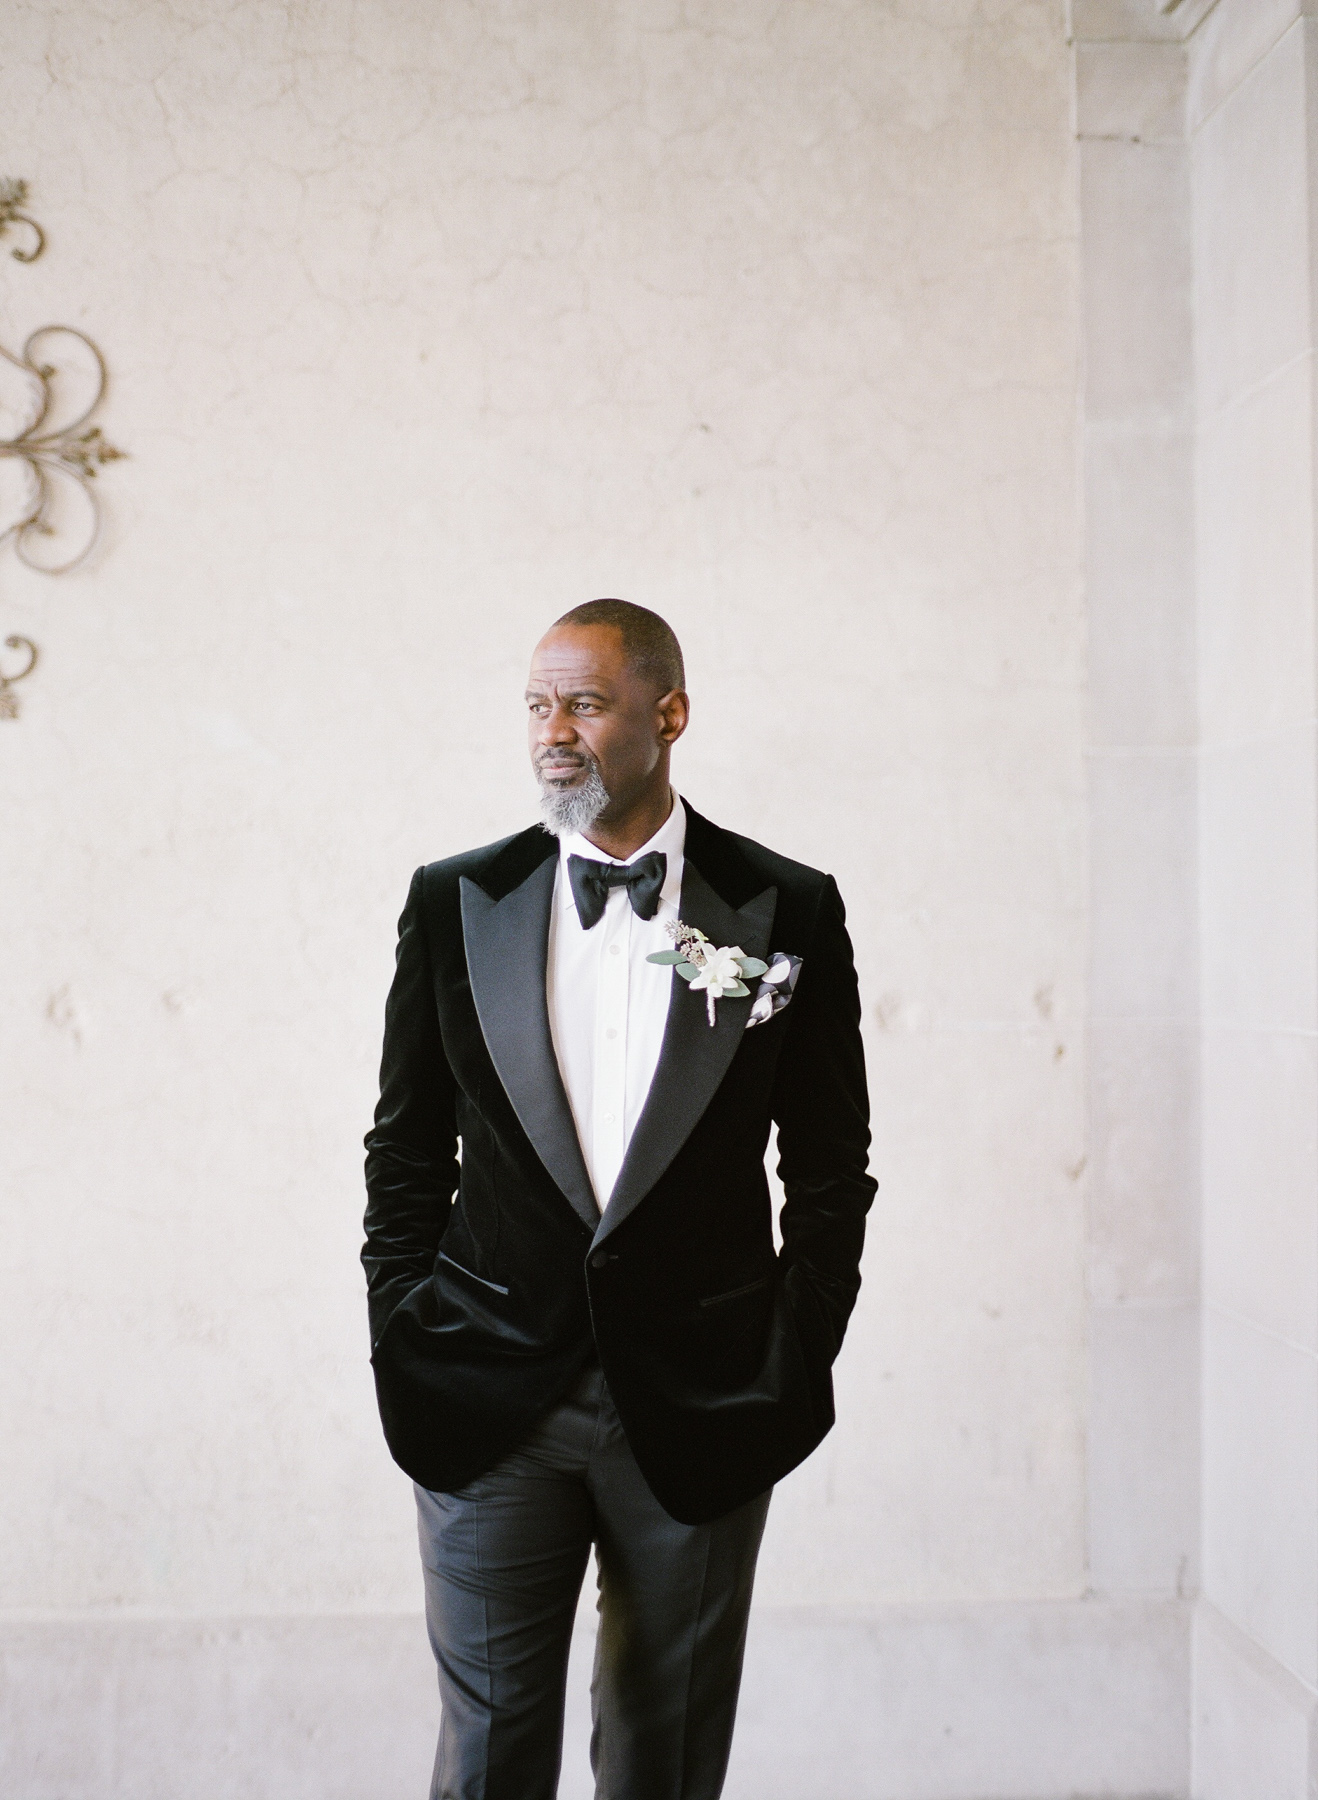 Brian-McKnight-wedding-oheka-castle-046.jpg